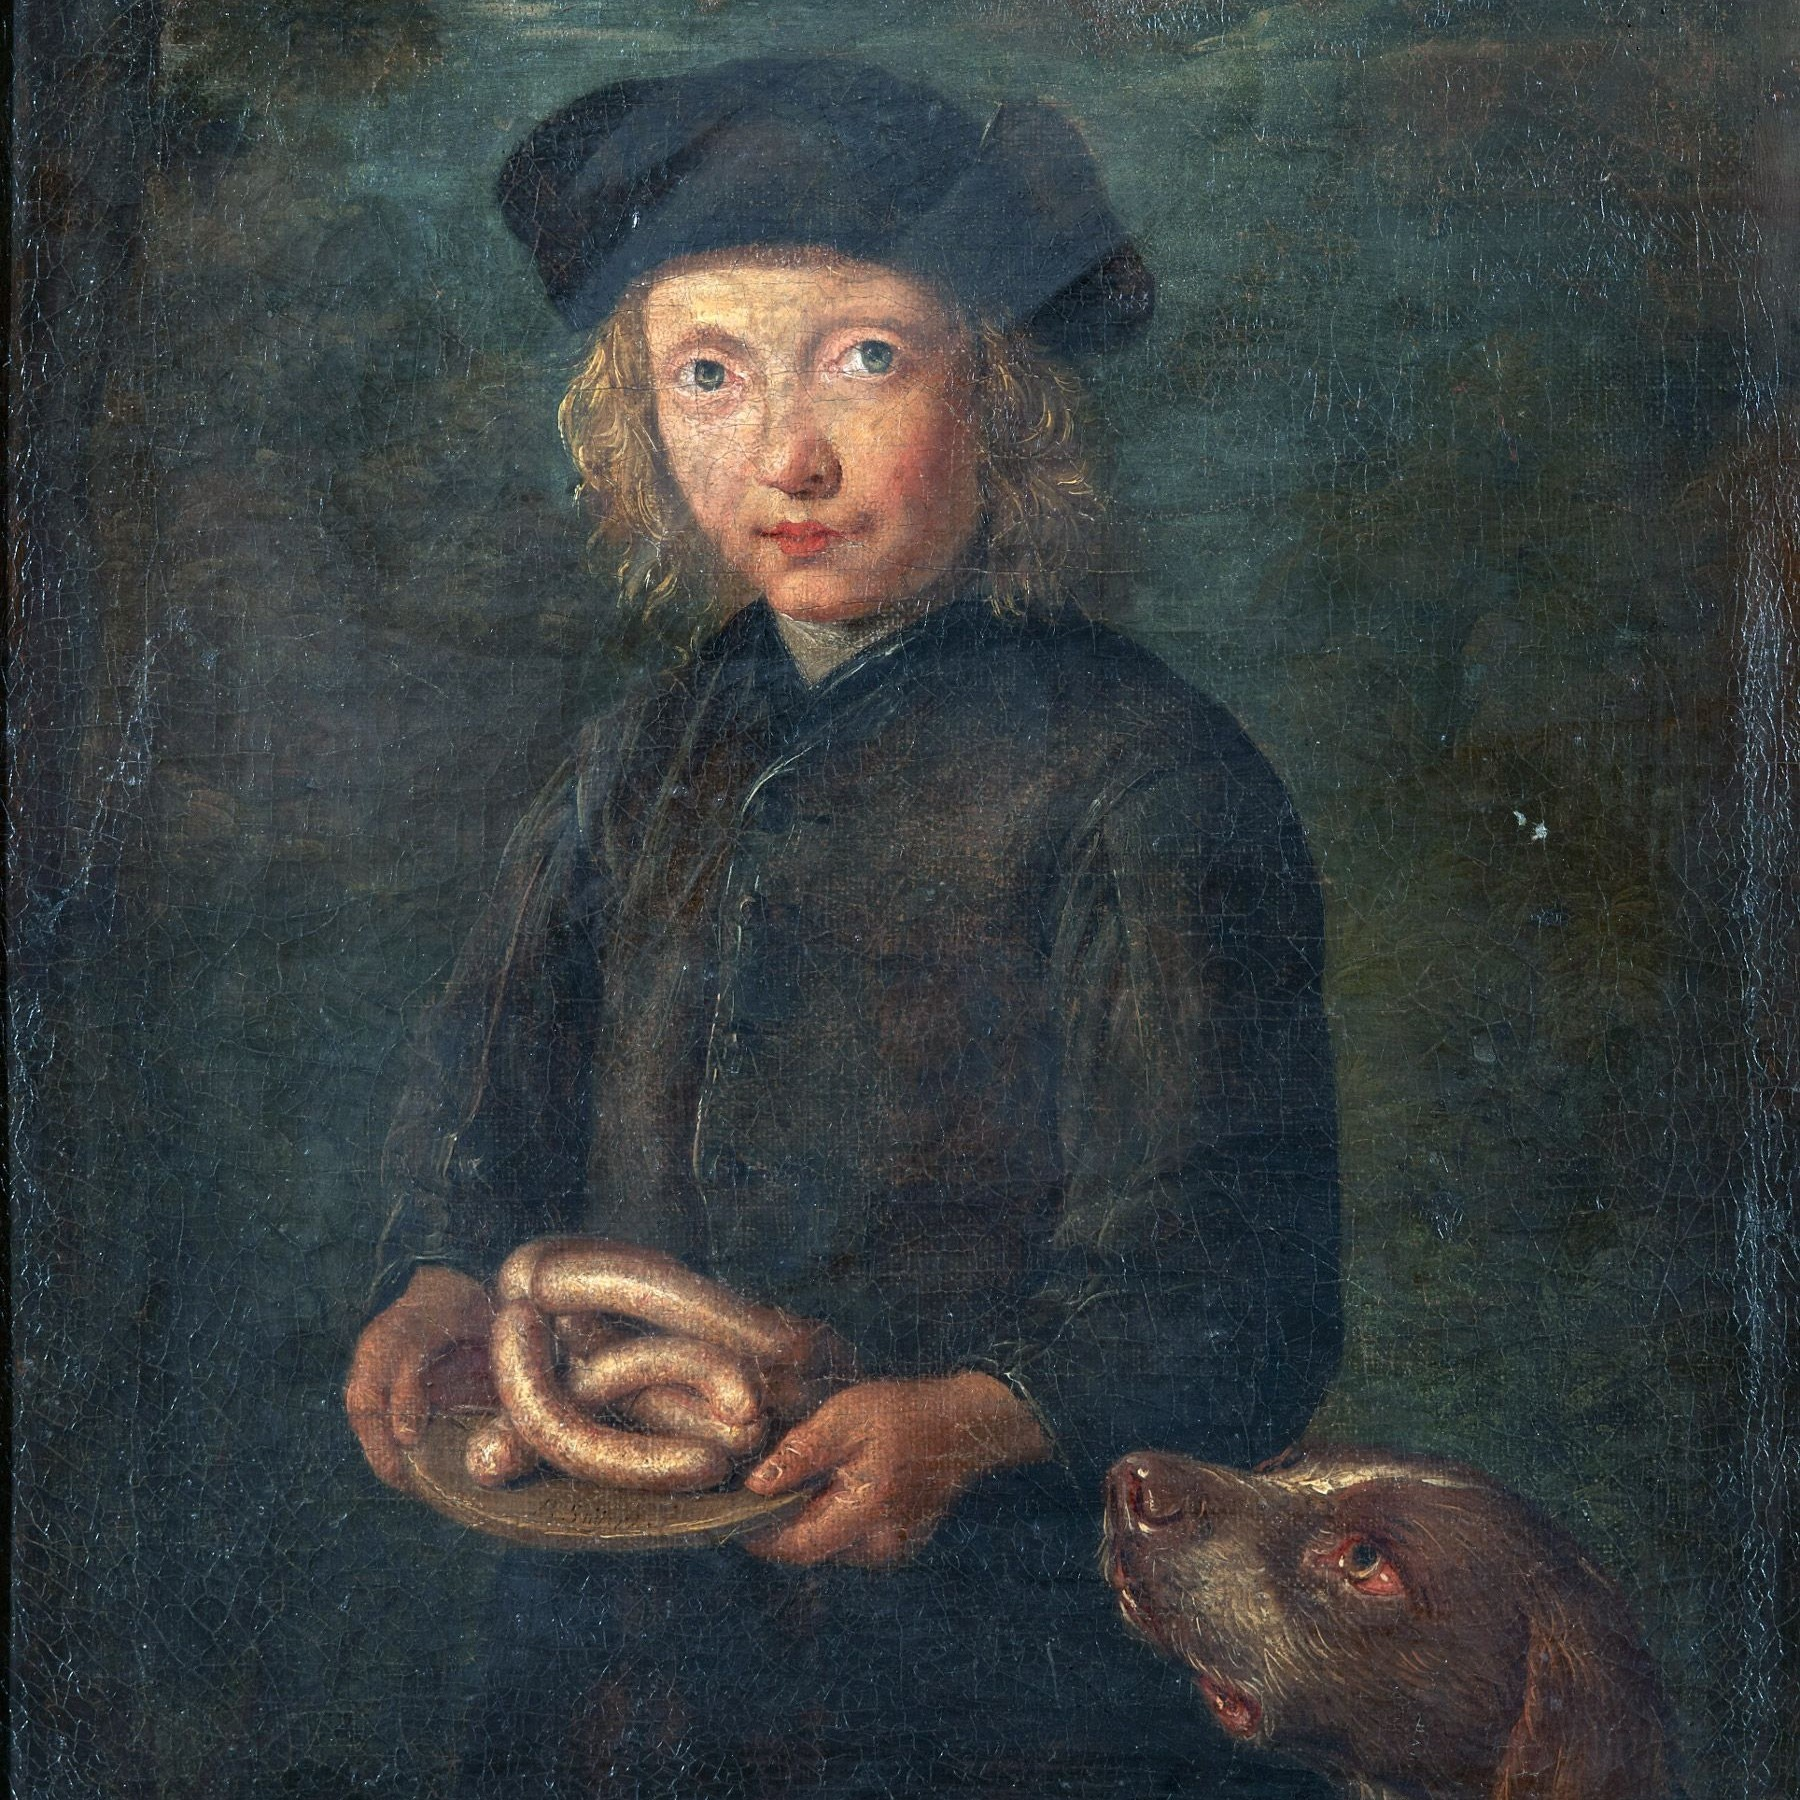 Gosse med Korv och Hund (Boy with Sausage and Dog), Petrus Snyers (1681–1752)